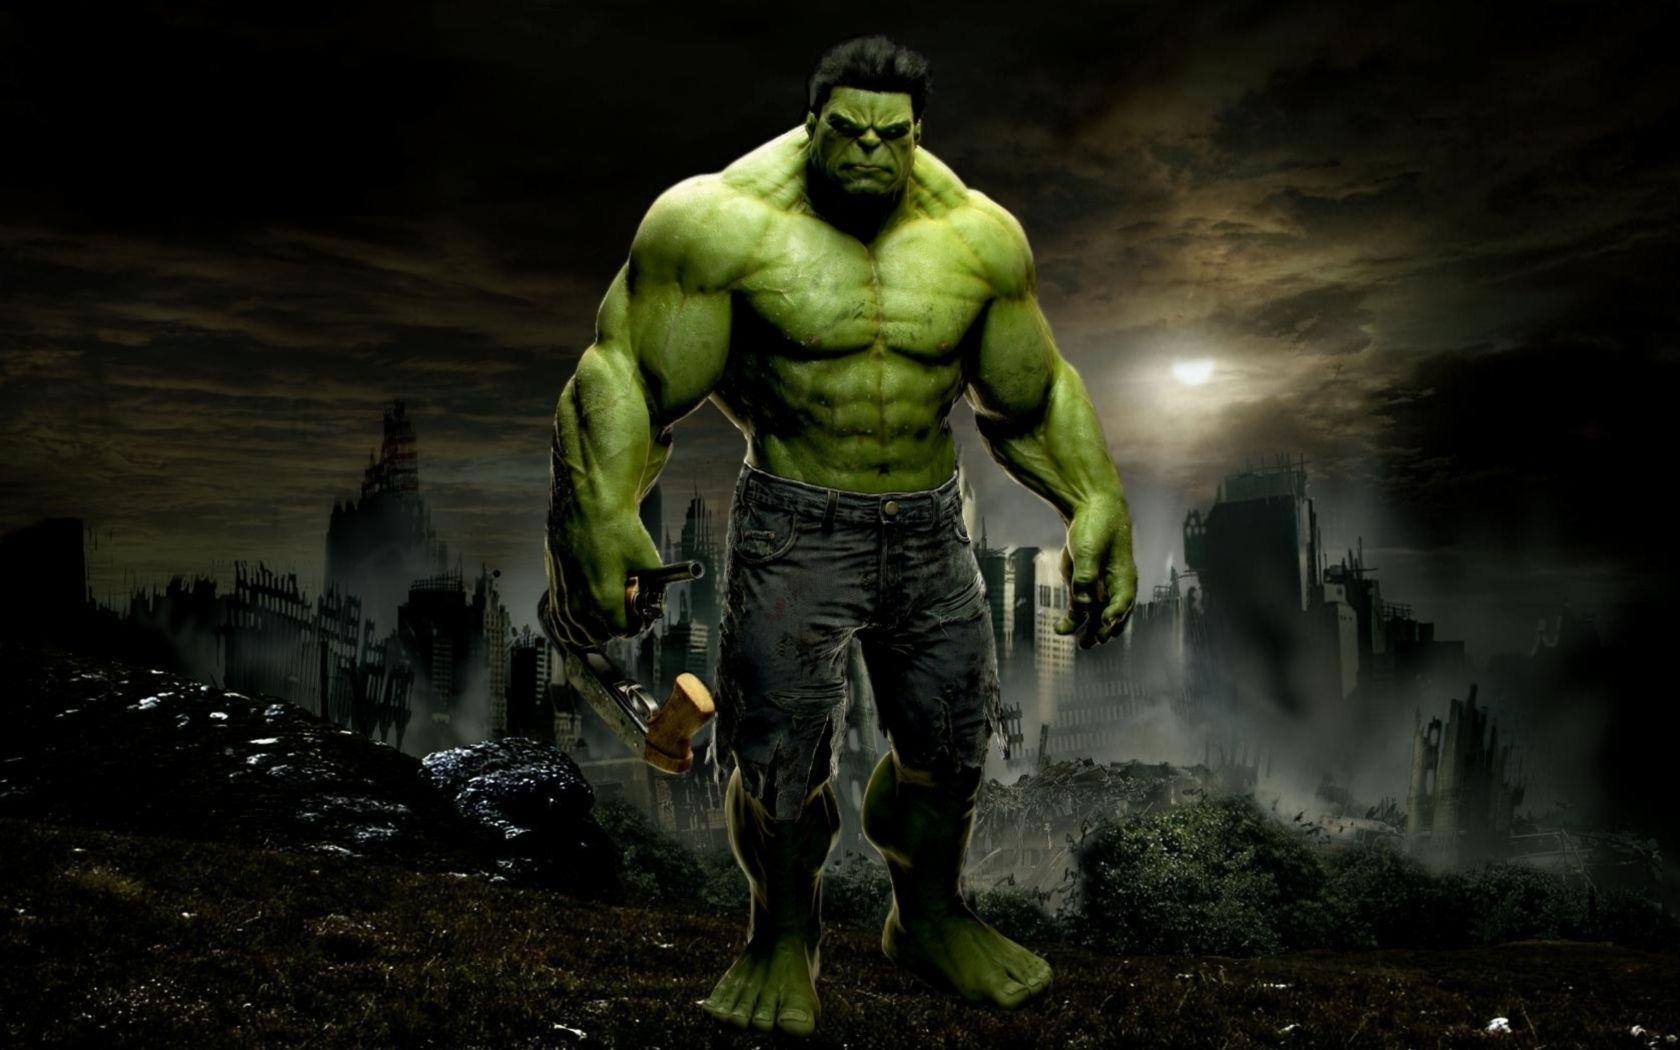 Best Wallpaper Marvel The Incredible Hulk - 4c15f8dde4b267cfce629e0d0025b90b  Image_48983.jpg